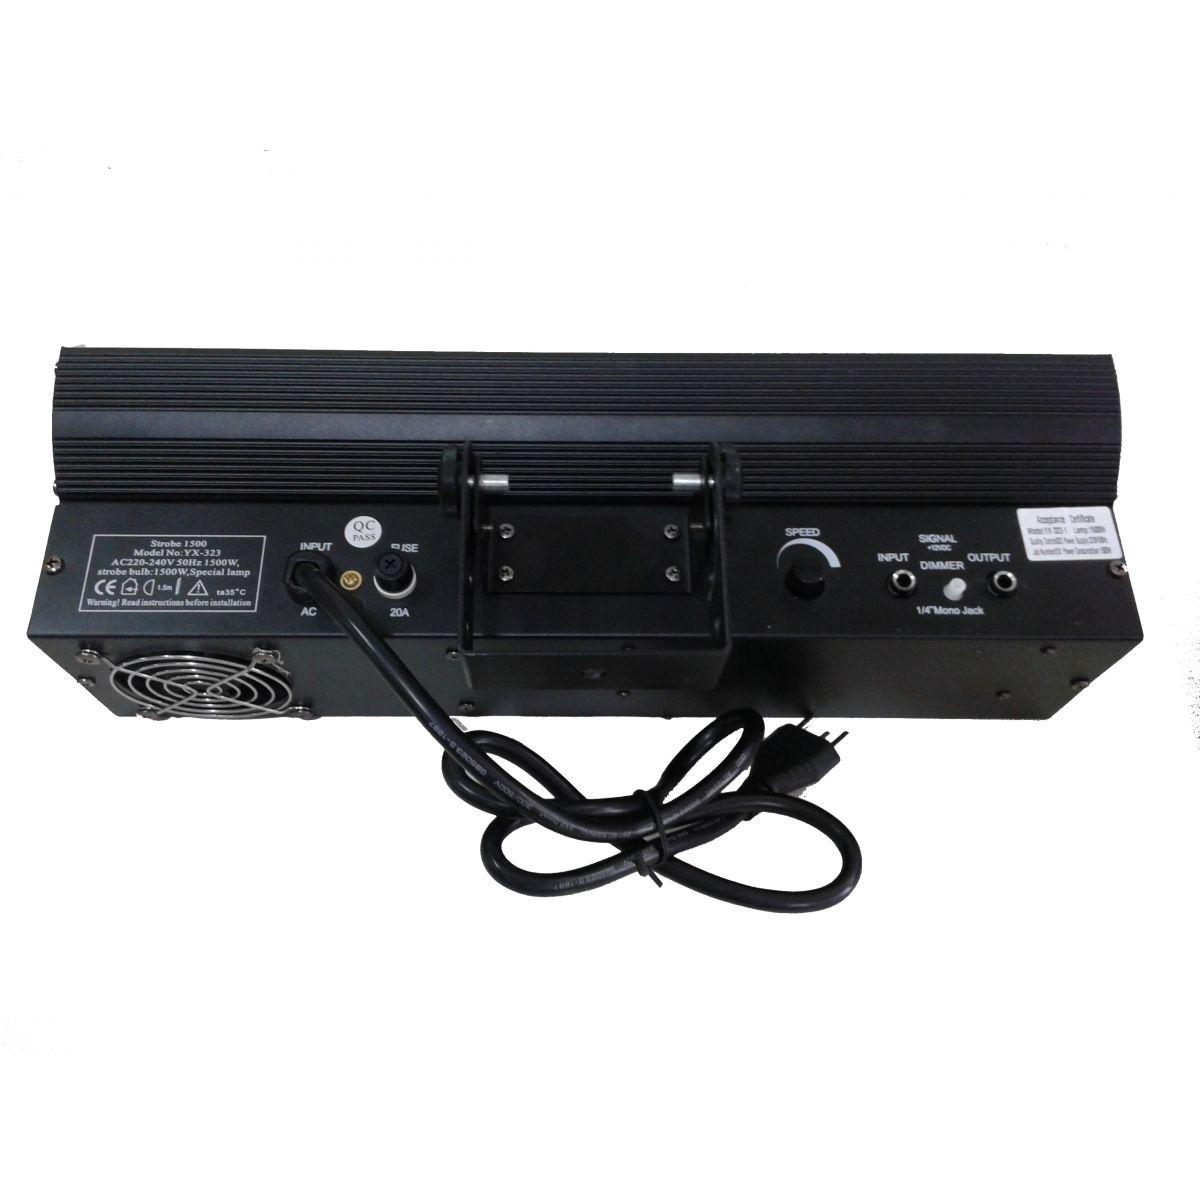 Strobo 1500W 220V - YX-323-1 - AH LIGHT